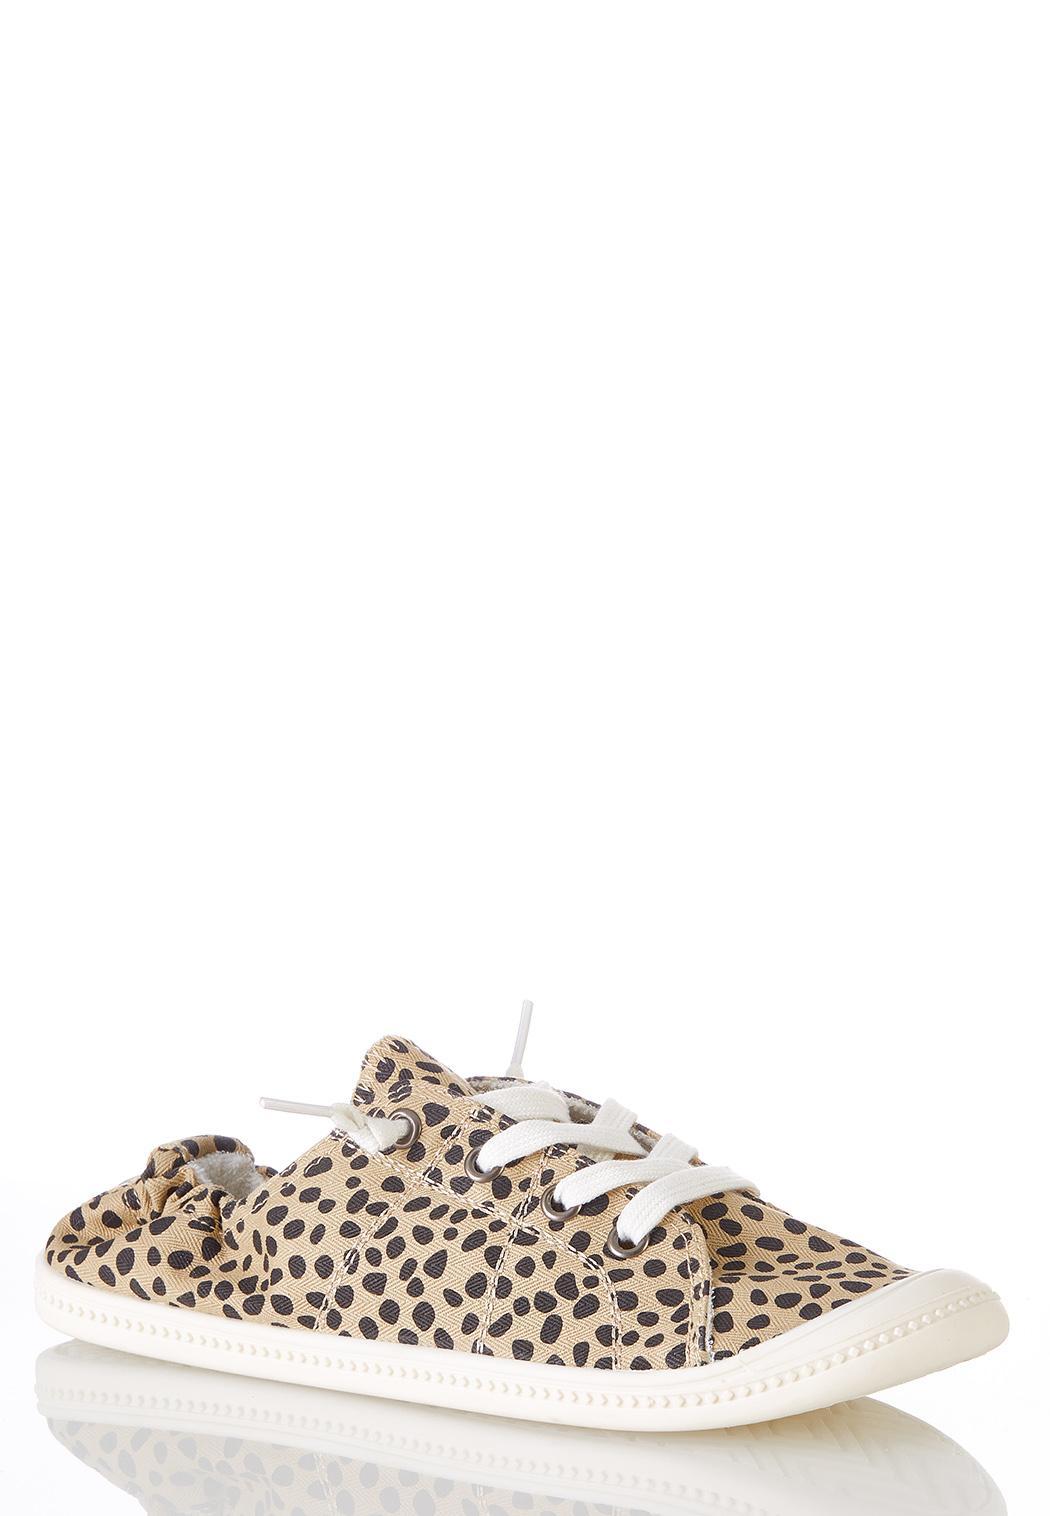 Cheetah Scrunch Sneakers